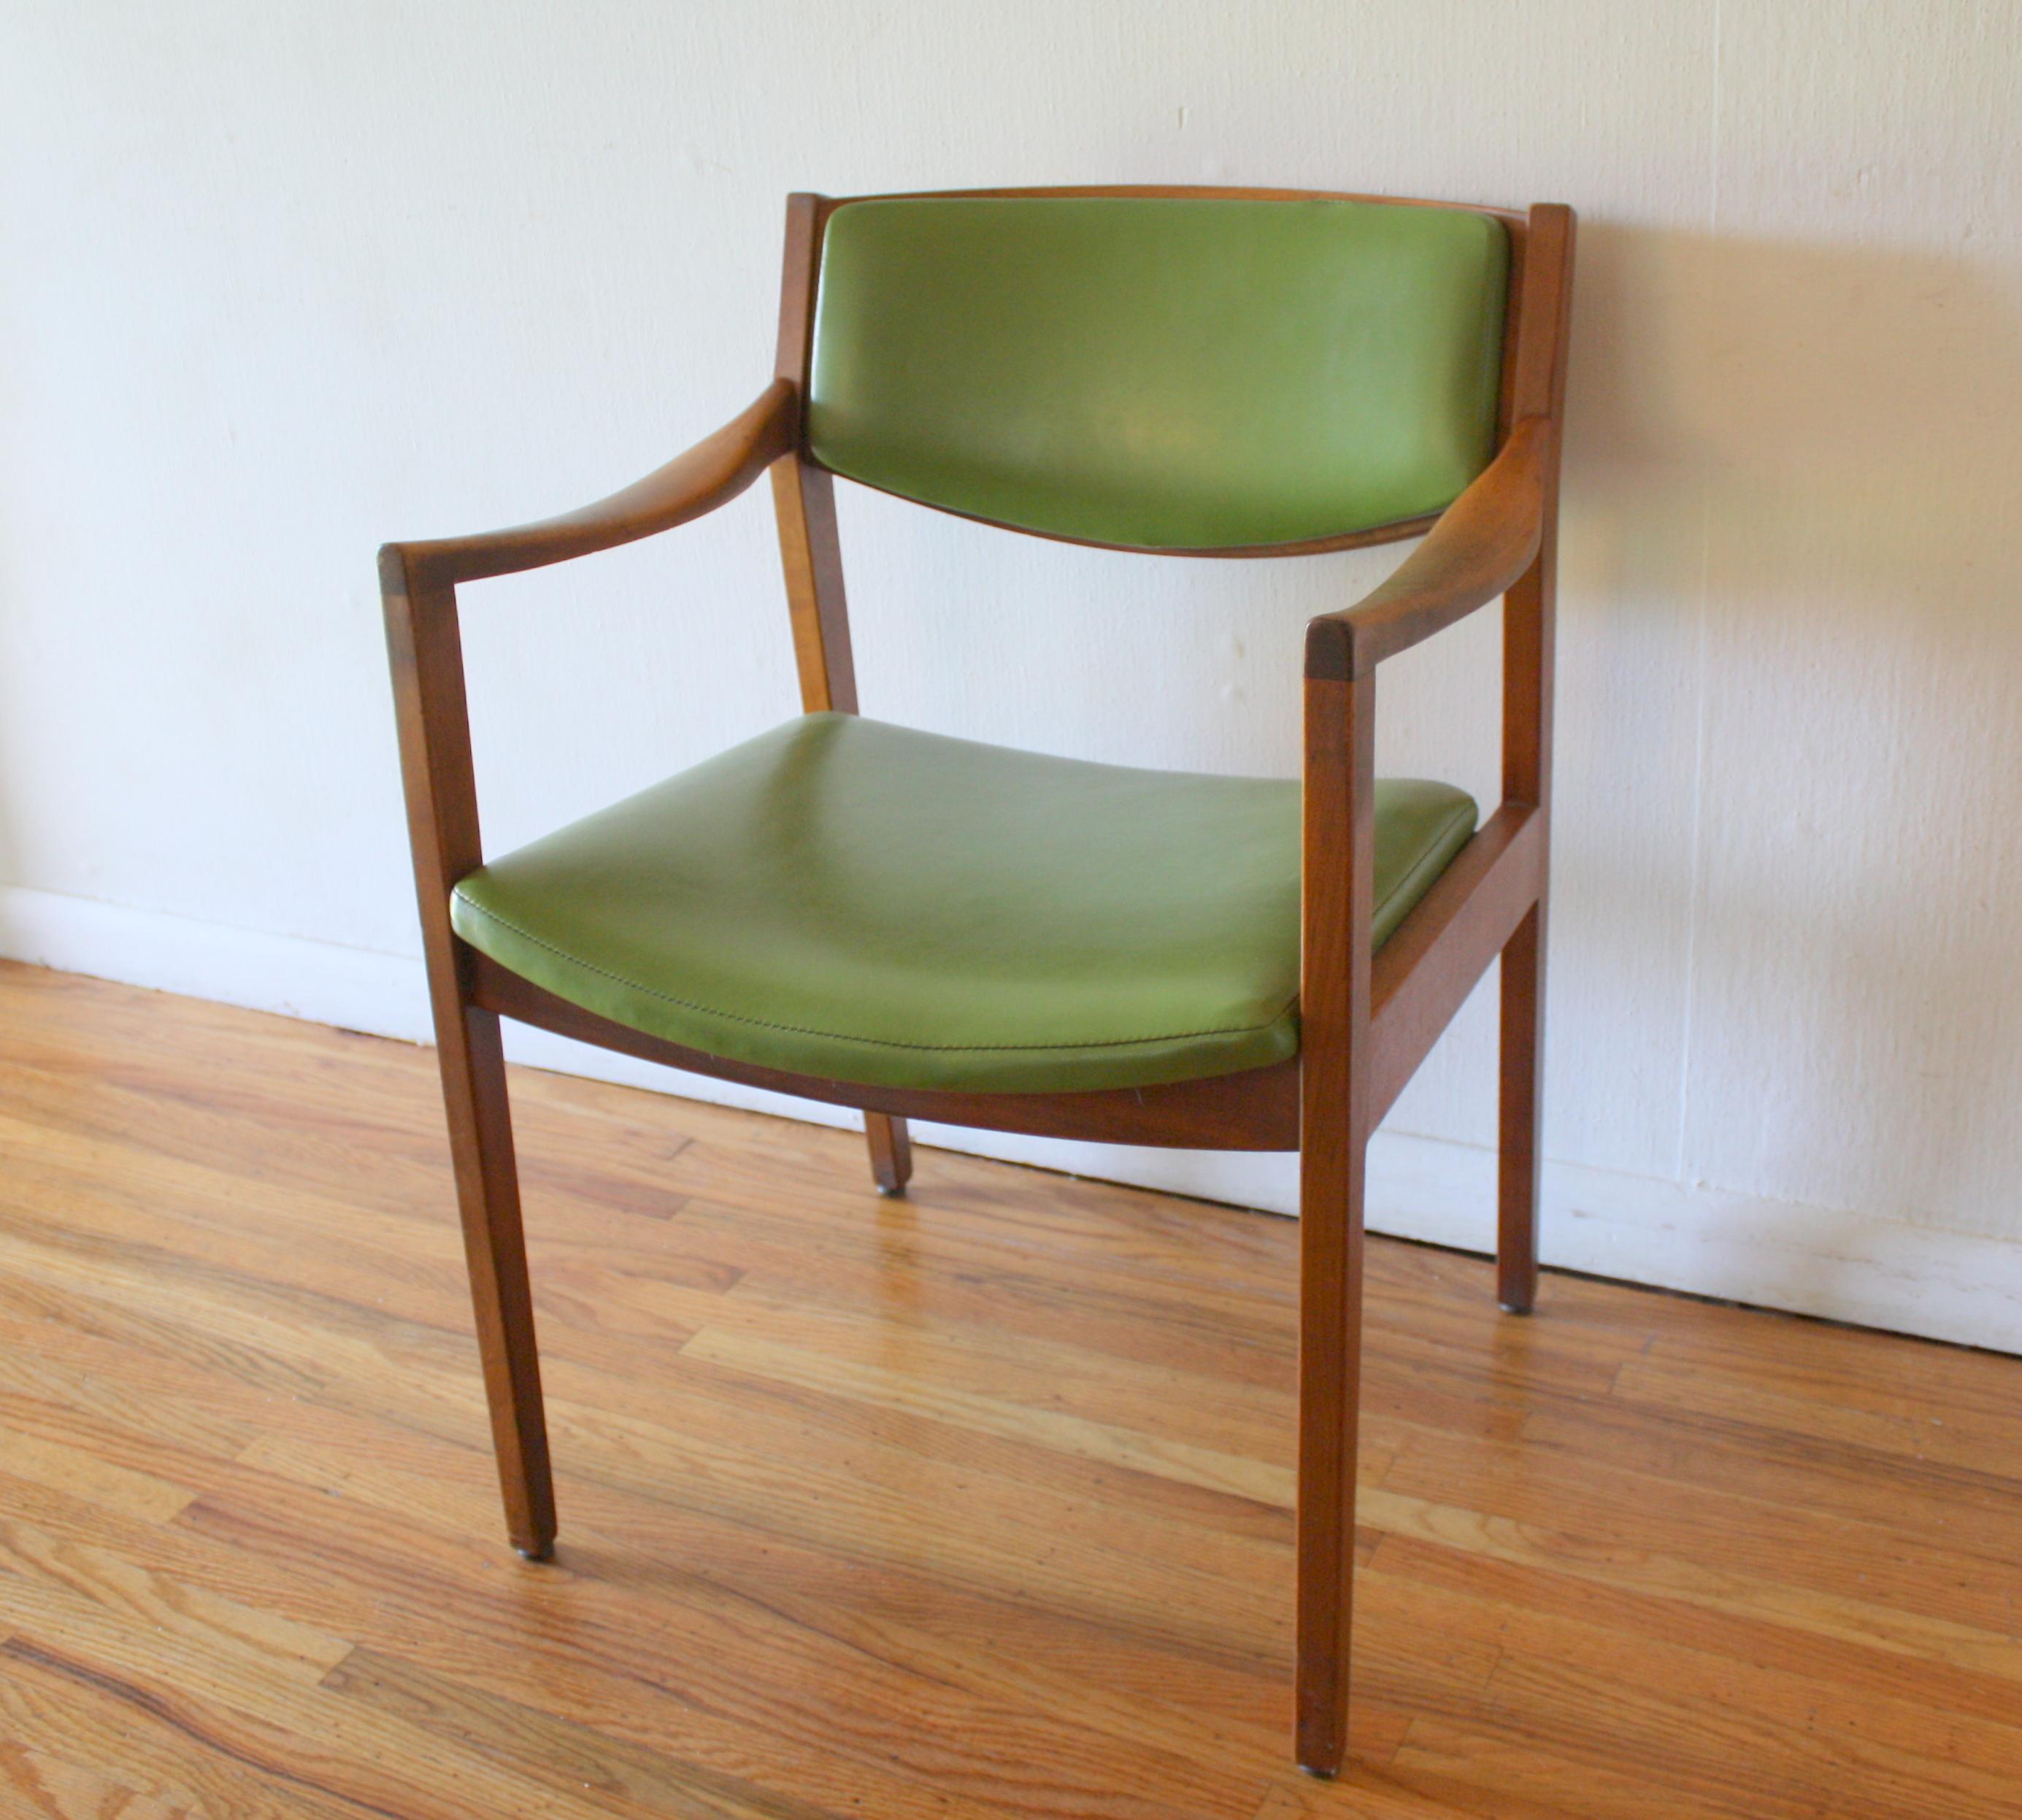 mcm avocado green arm chair 1